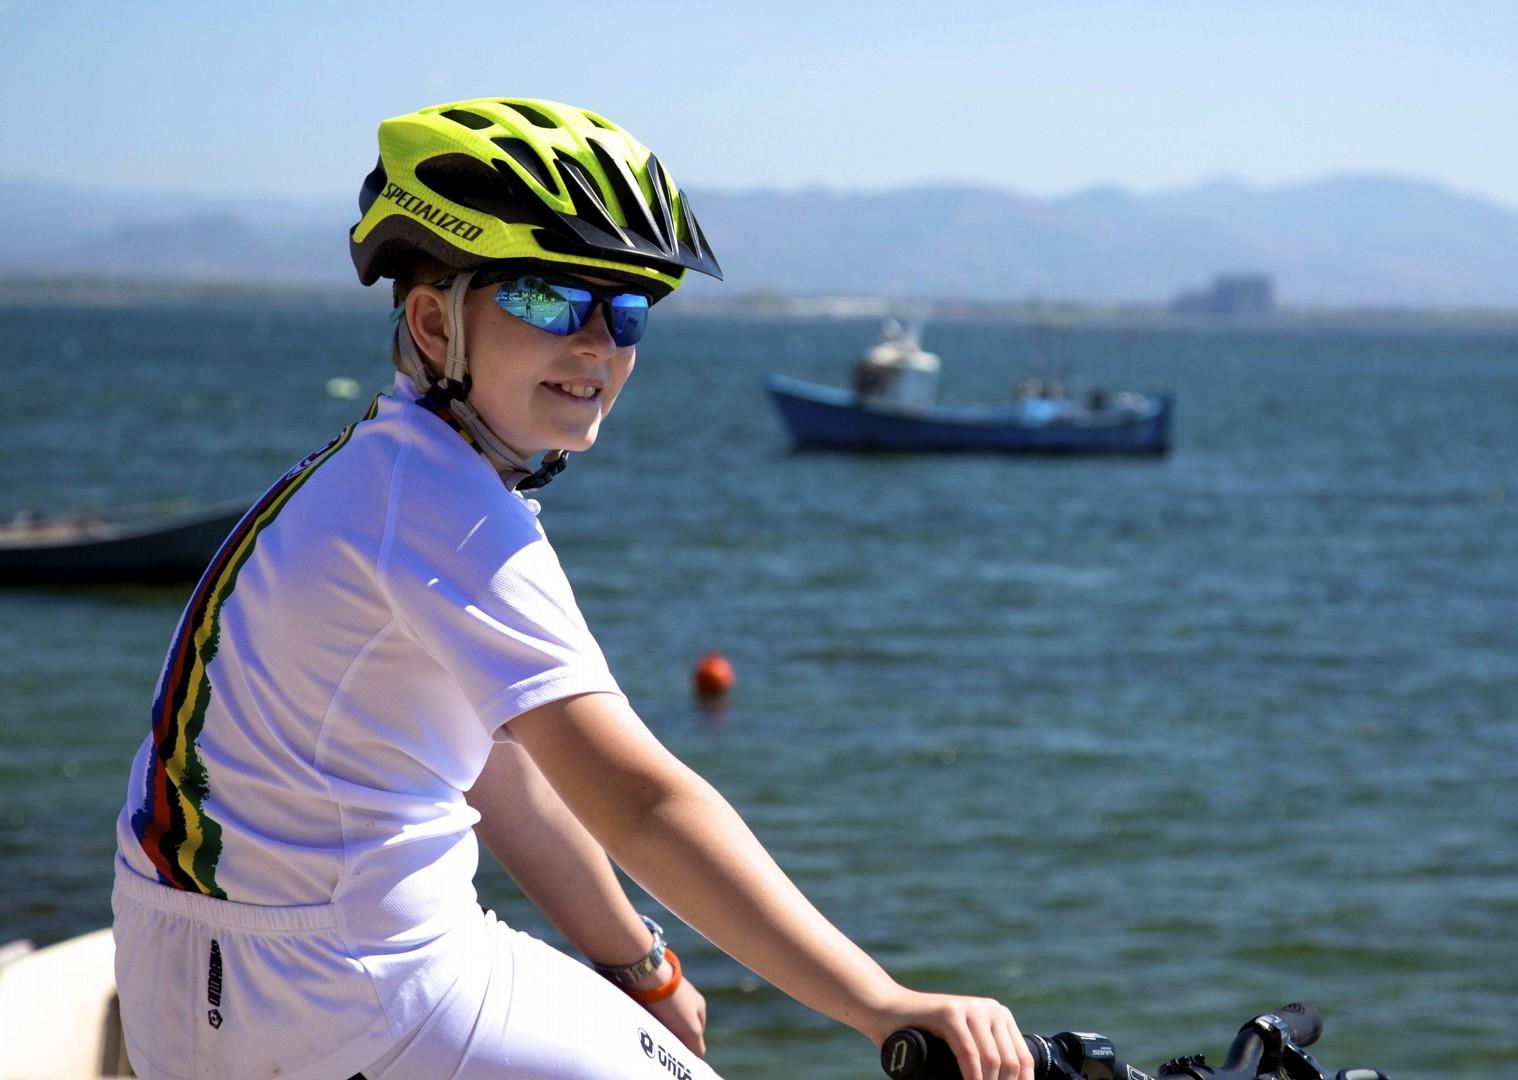 SardiniaCycling-106.jpg - Italy - Sardinia - Family Flavours - Family Cycling